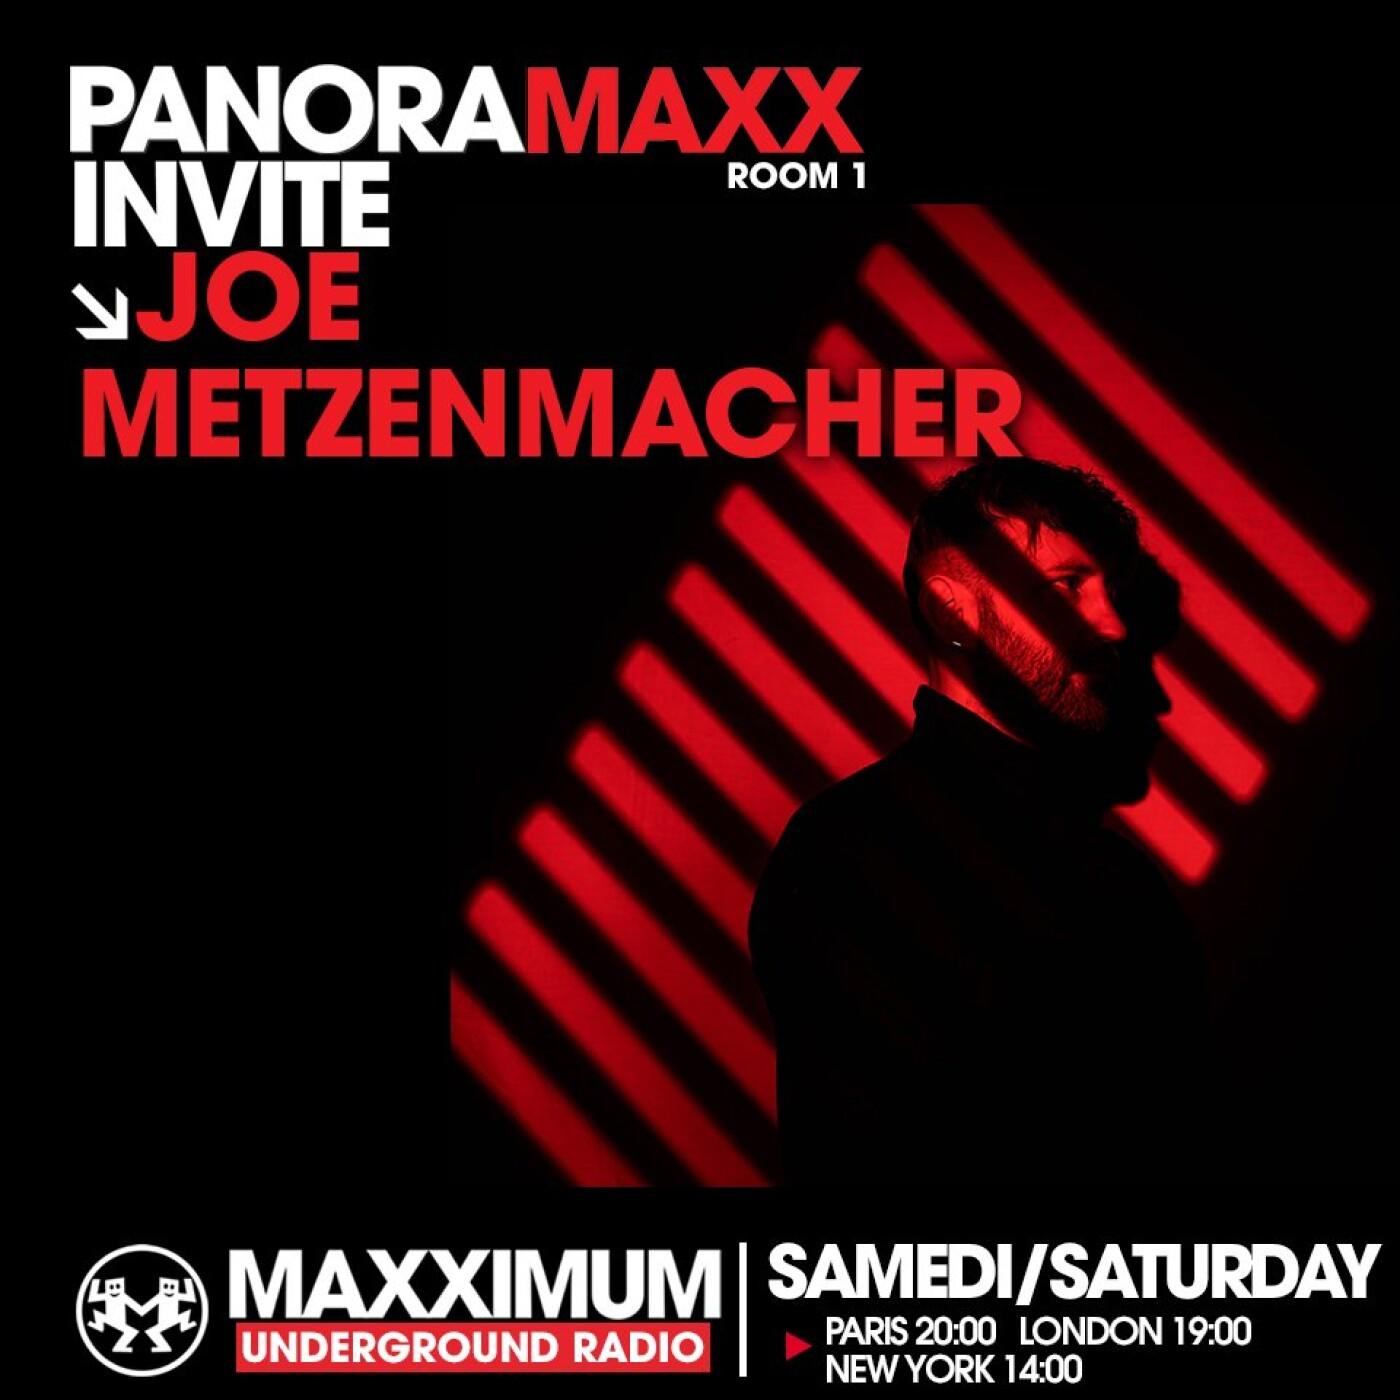 PANORAMAXX : JOE METZENMACHER